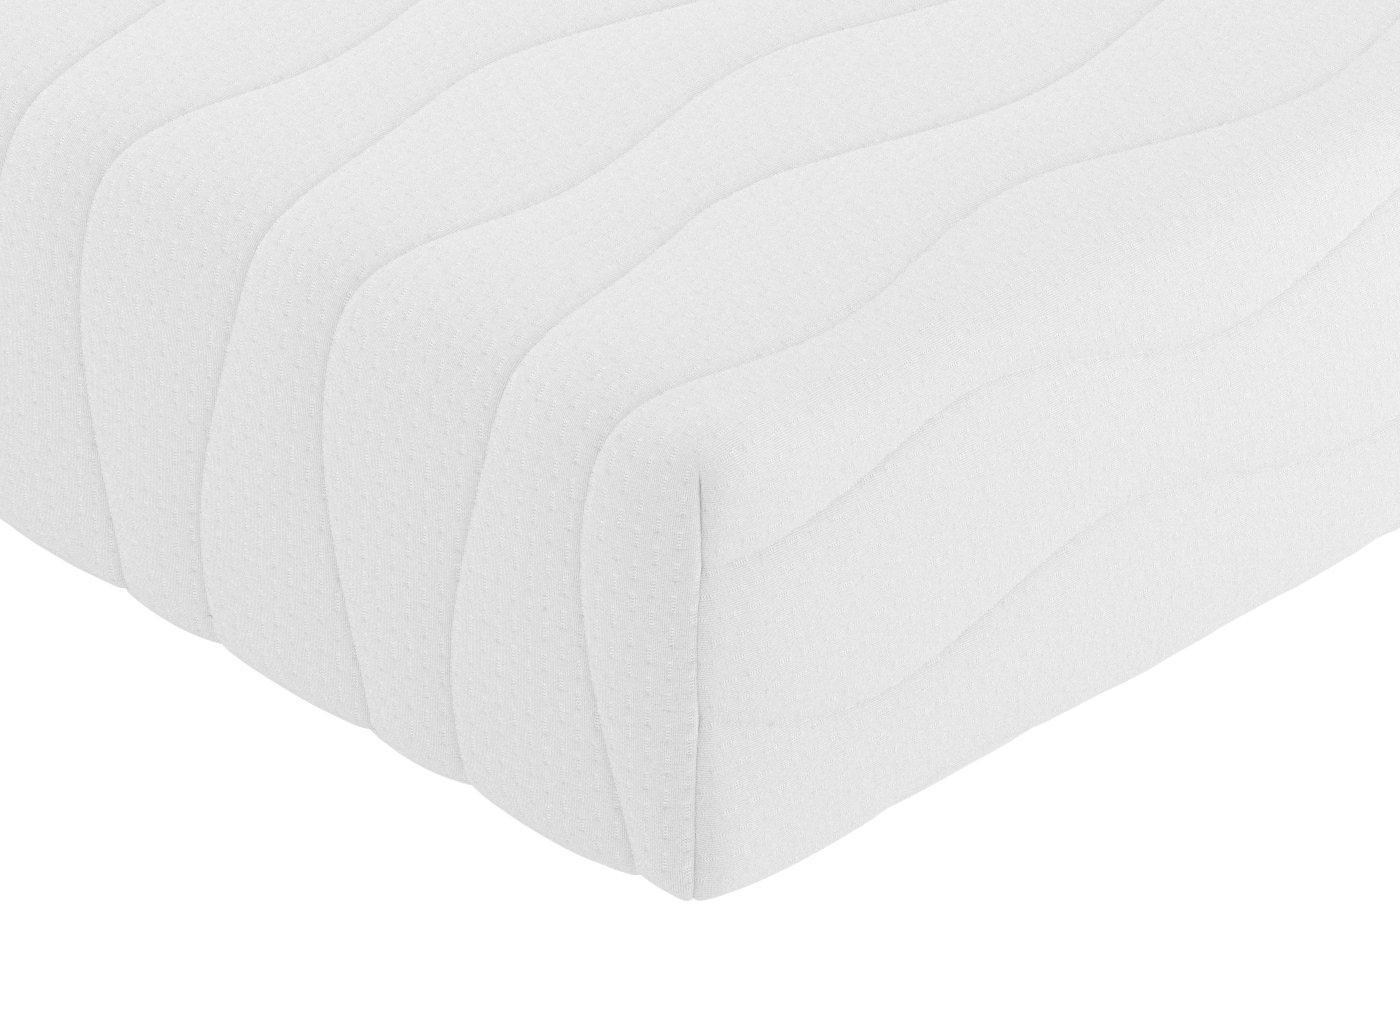 sleep-essentials-galway-memory-foam-mattress